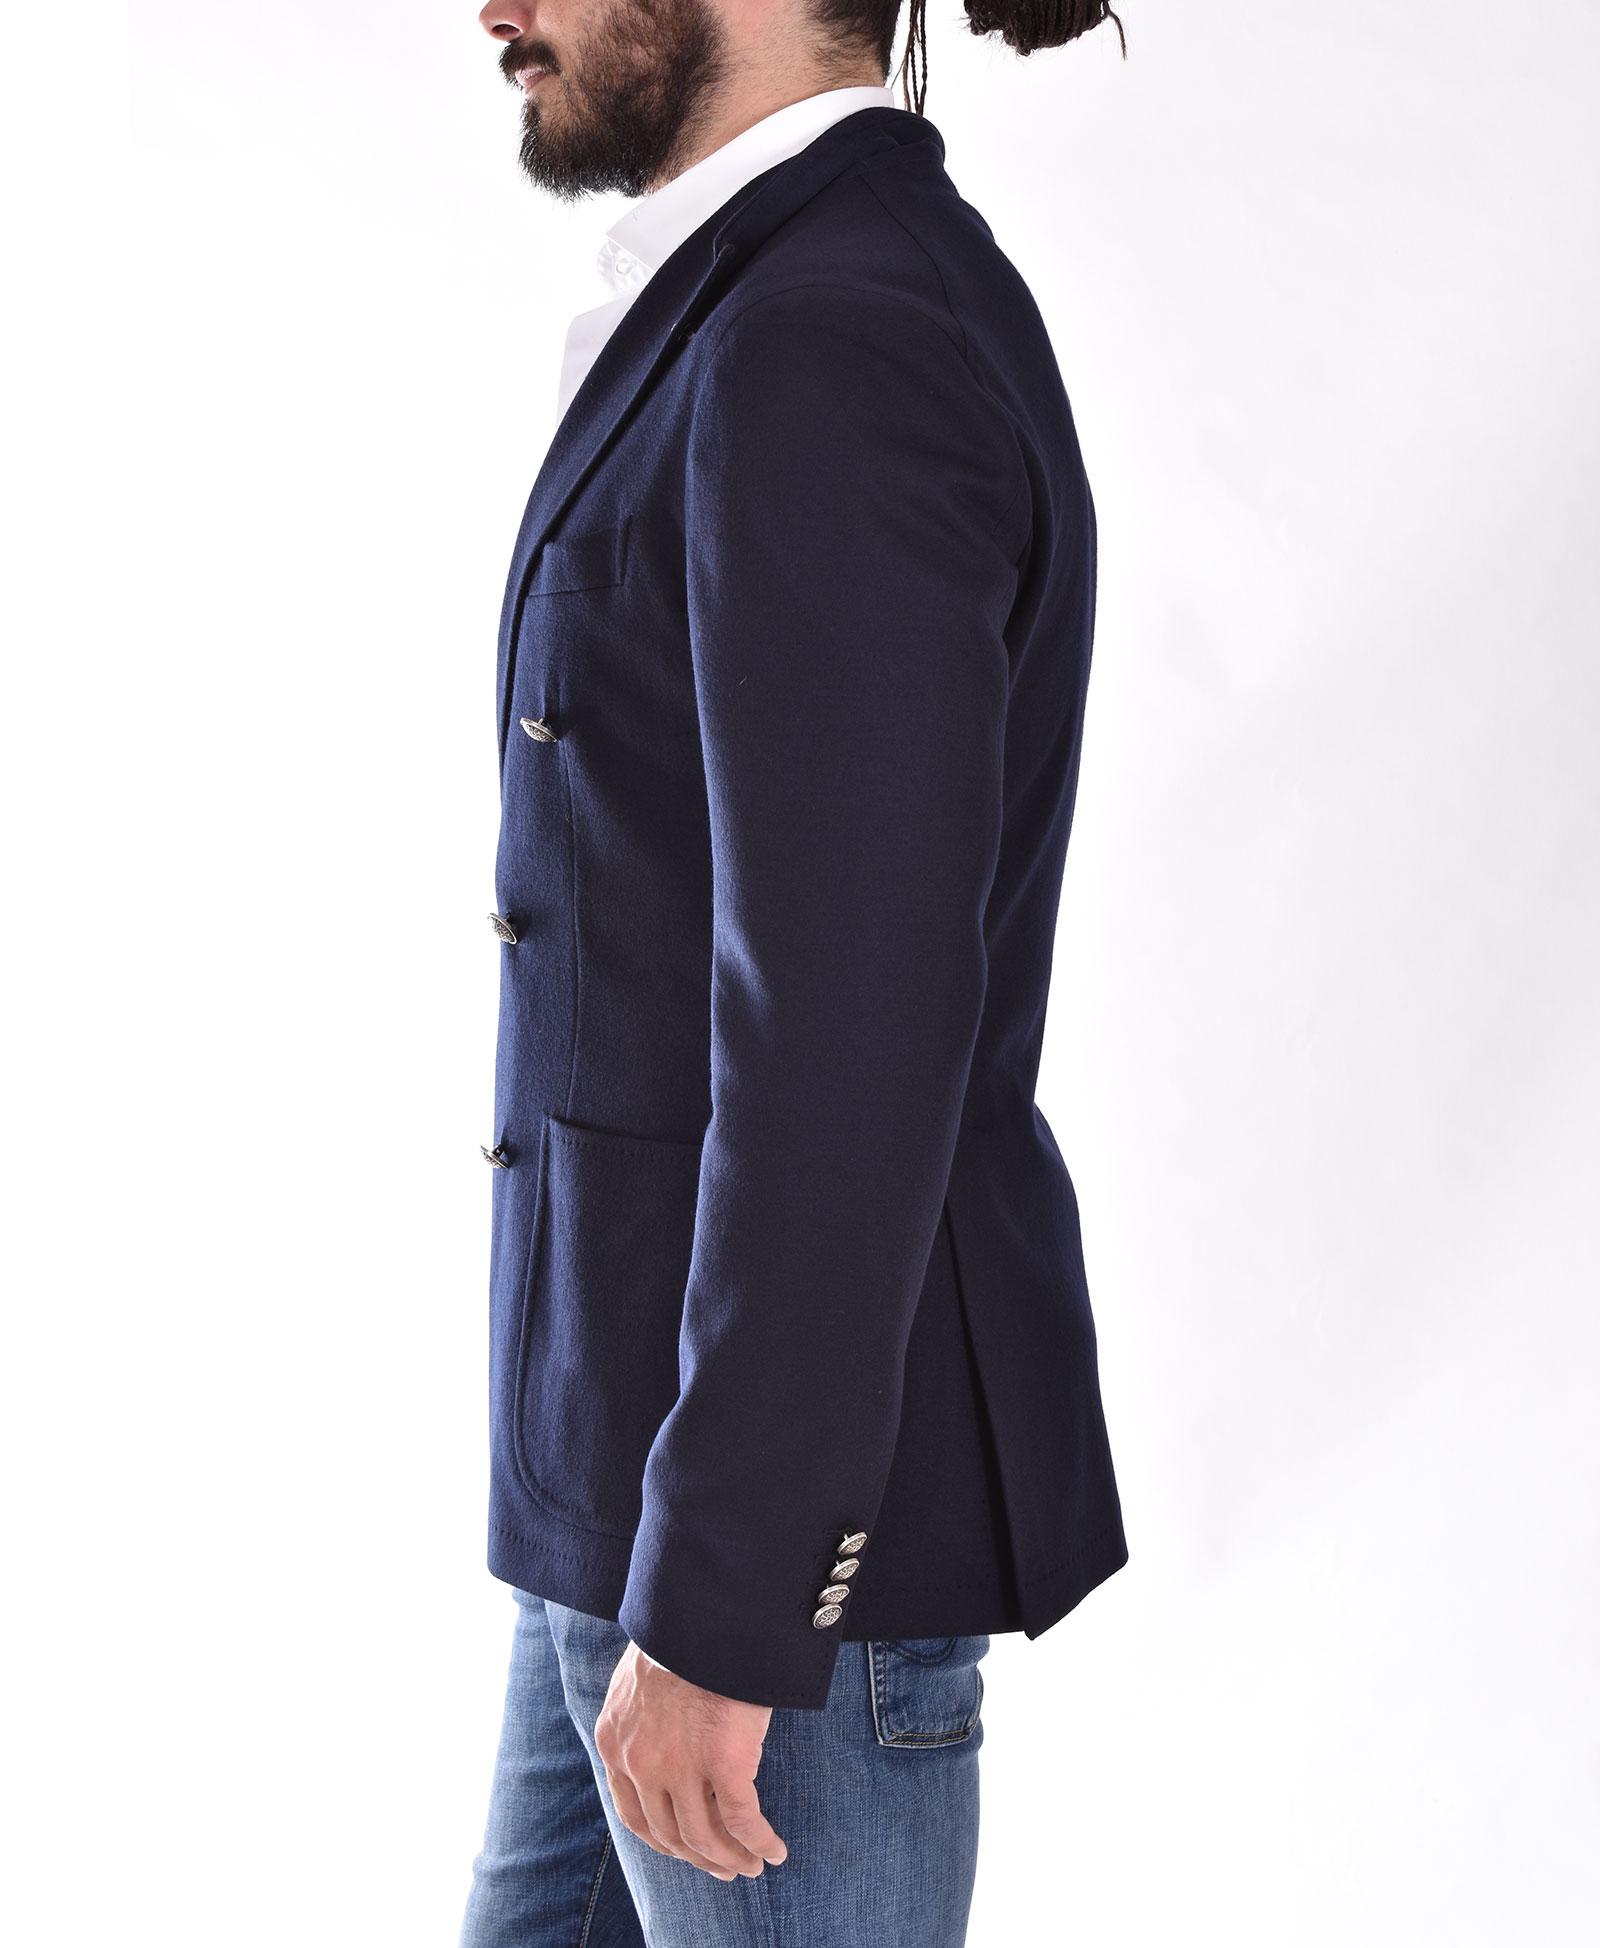 Tagliatore double-breasted G Darrel blue jacket TAGLIATORE | G-DARRELB657